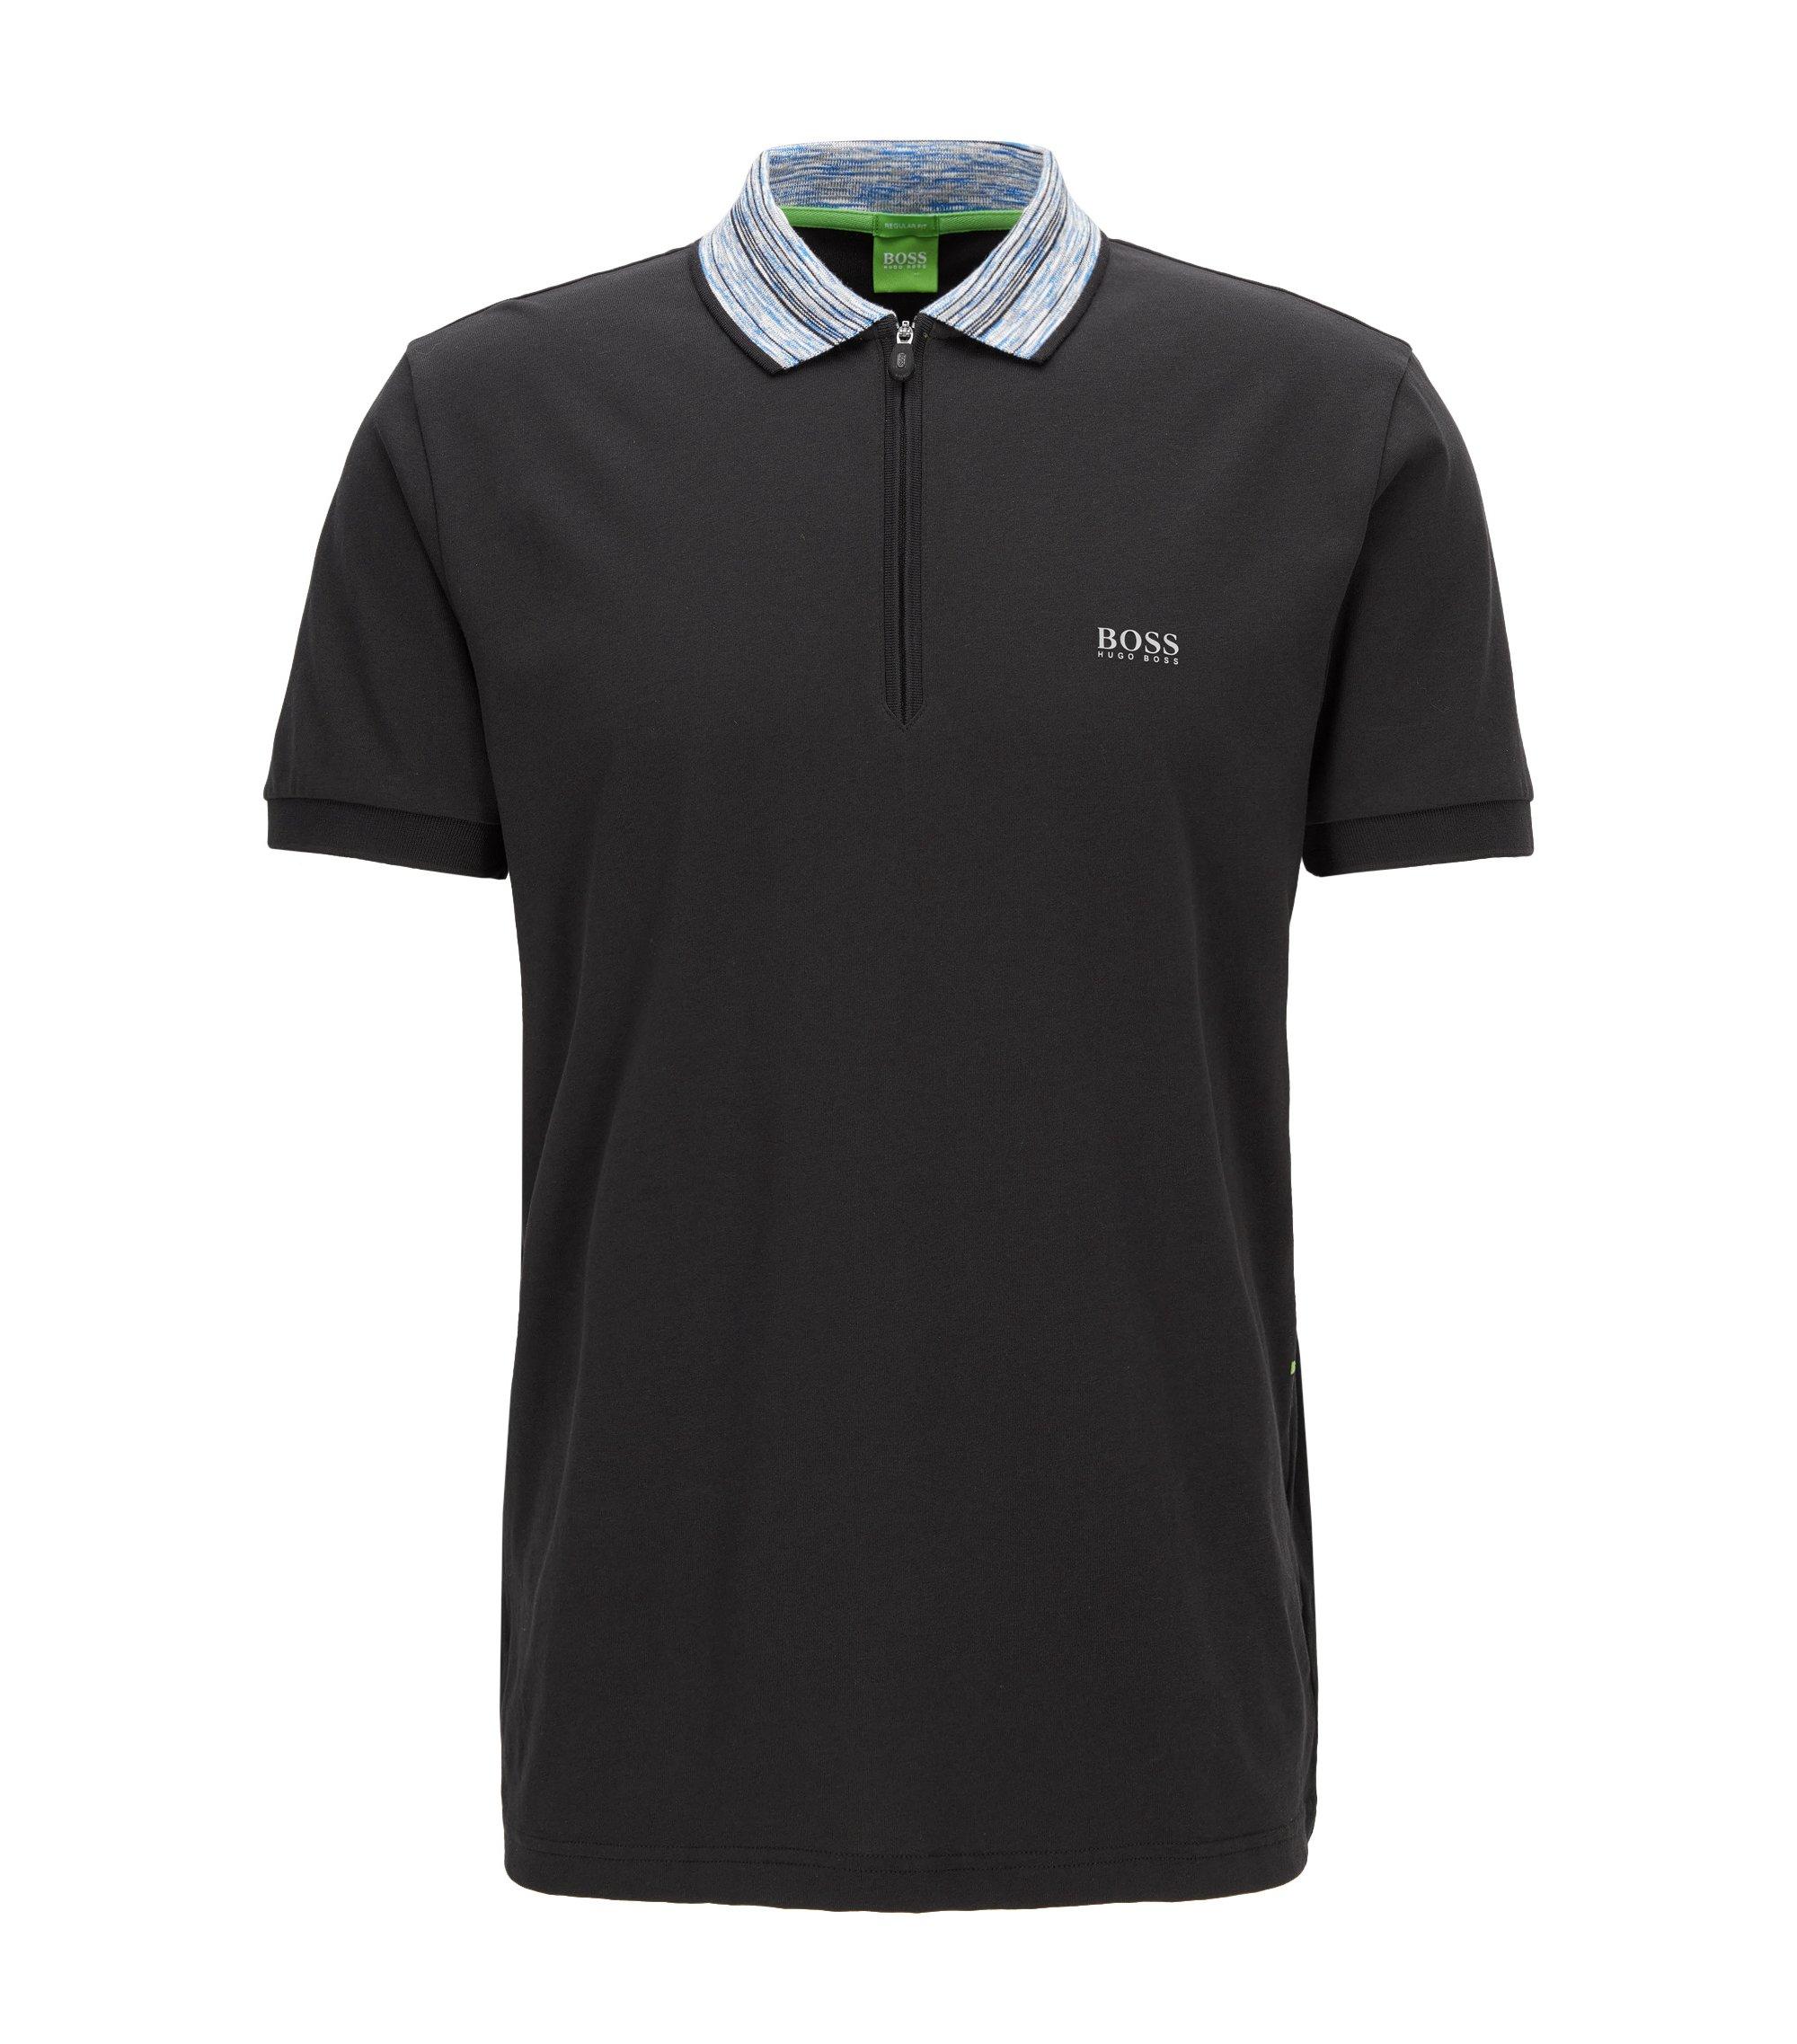 Cotton Blend Contrast Stripe Polo Shirt, Modern Fit | Philix, Black